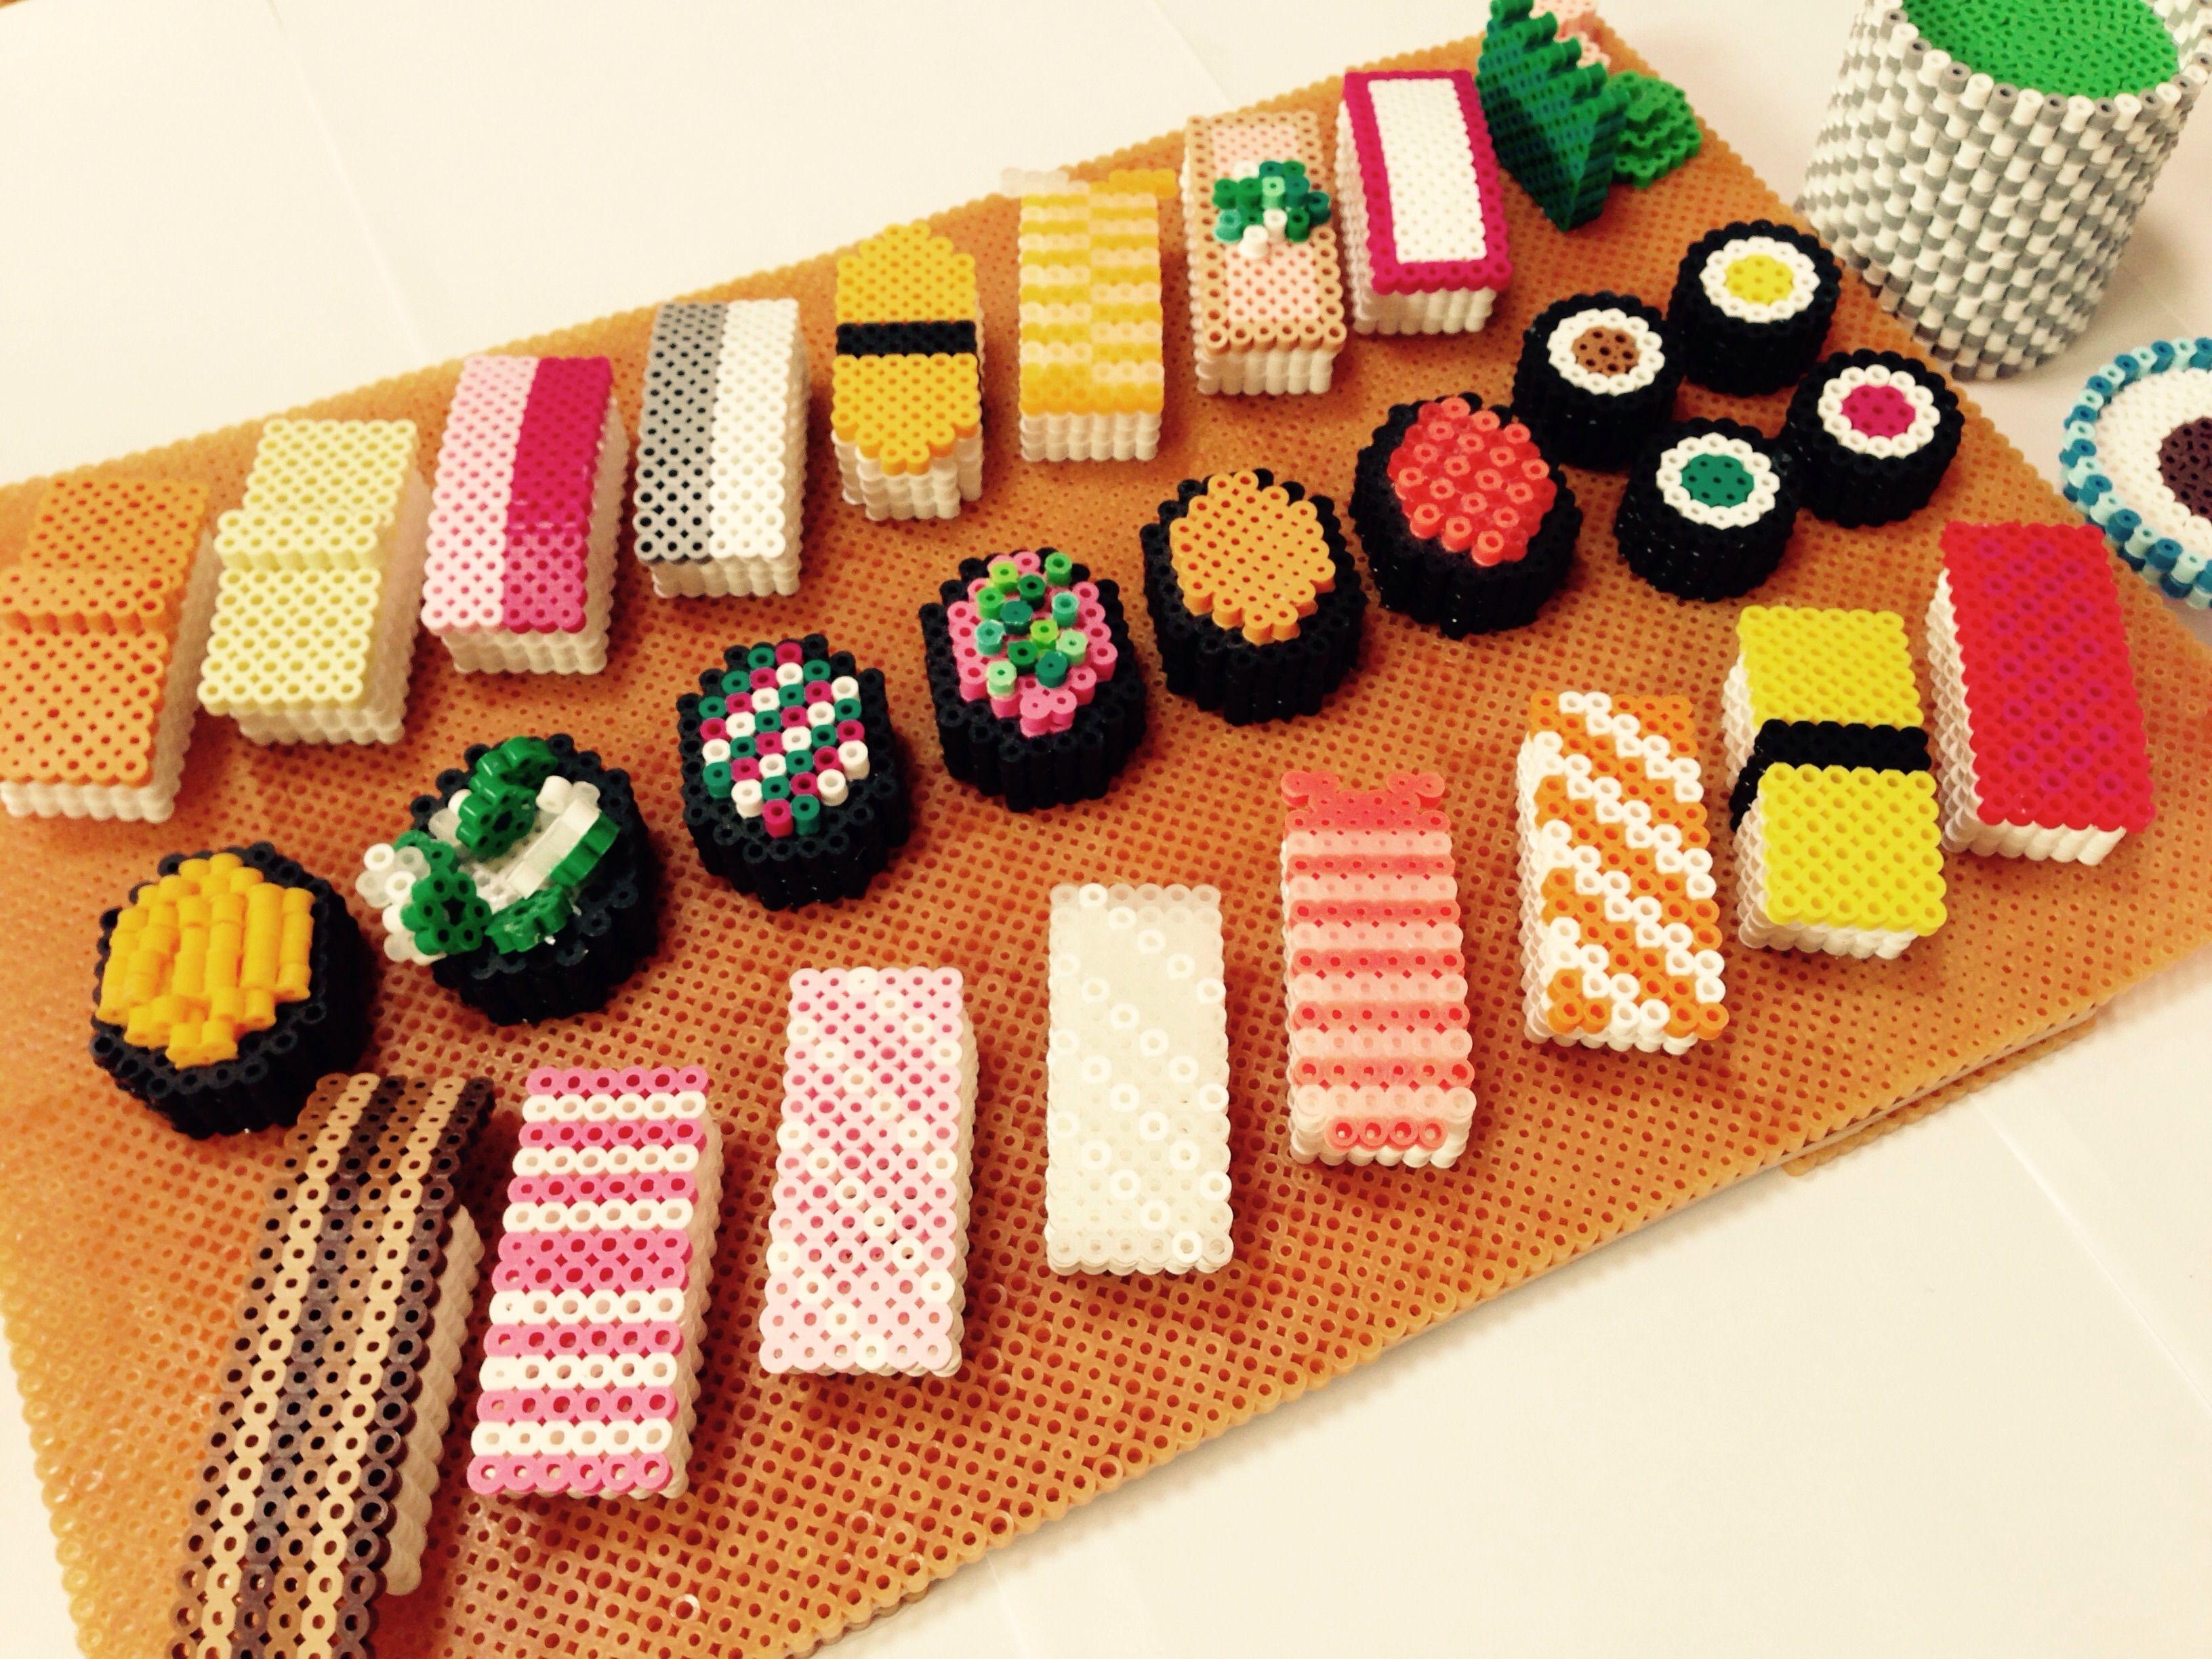 b gelperlen basteln mit b gelperlen kindergeburtstag pinterest perles repasser. Black Bedroom Furniture Sets. Home Design Ideas